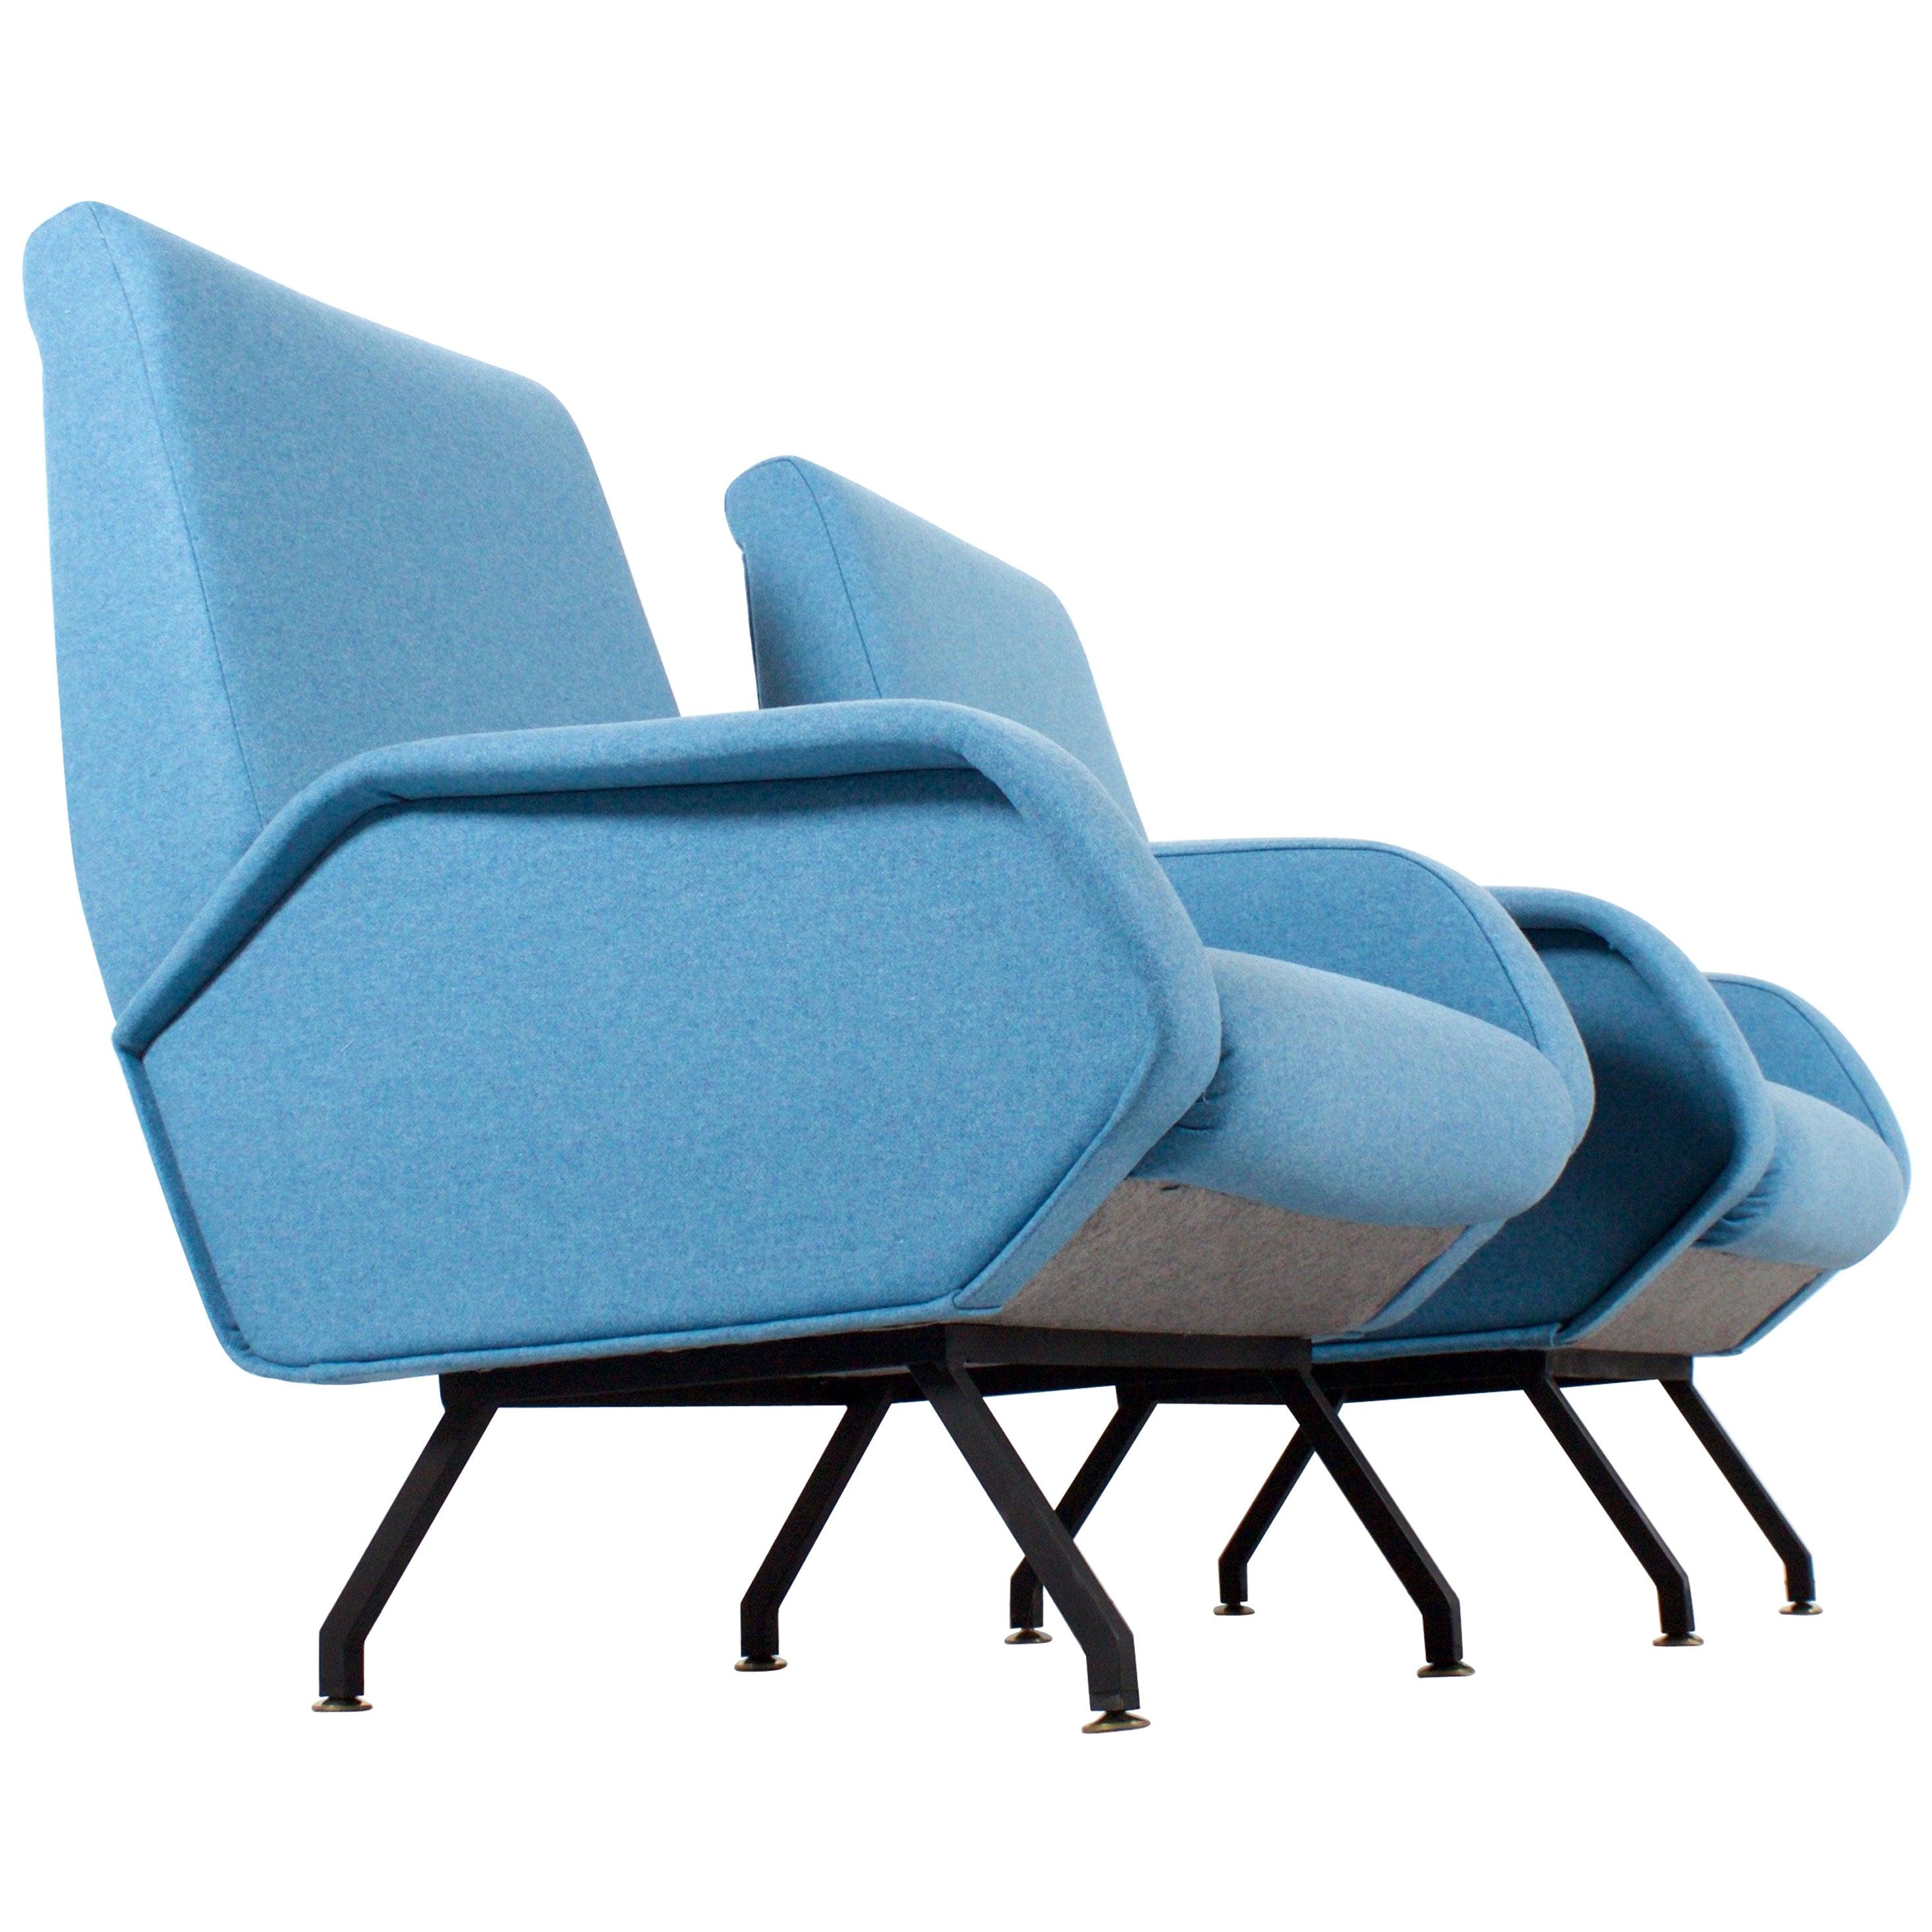 Pair of Italian Midcentury Lounge Chairs Marco Zanuso Style